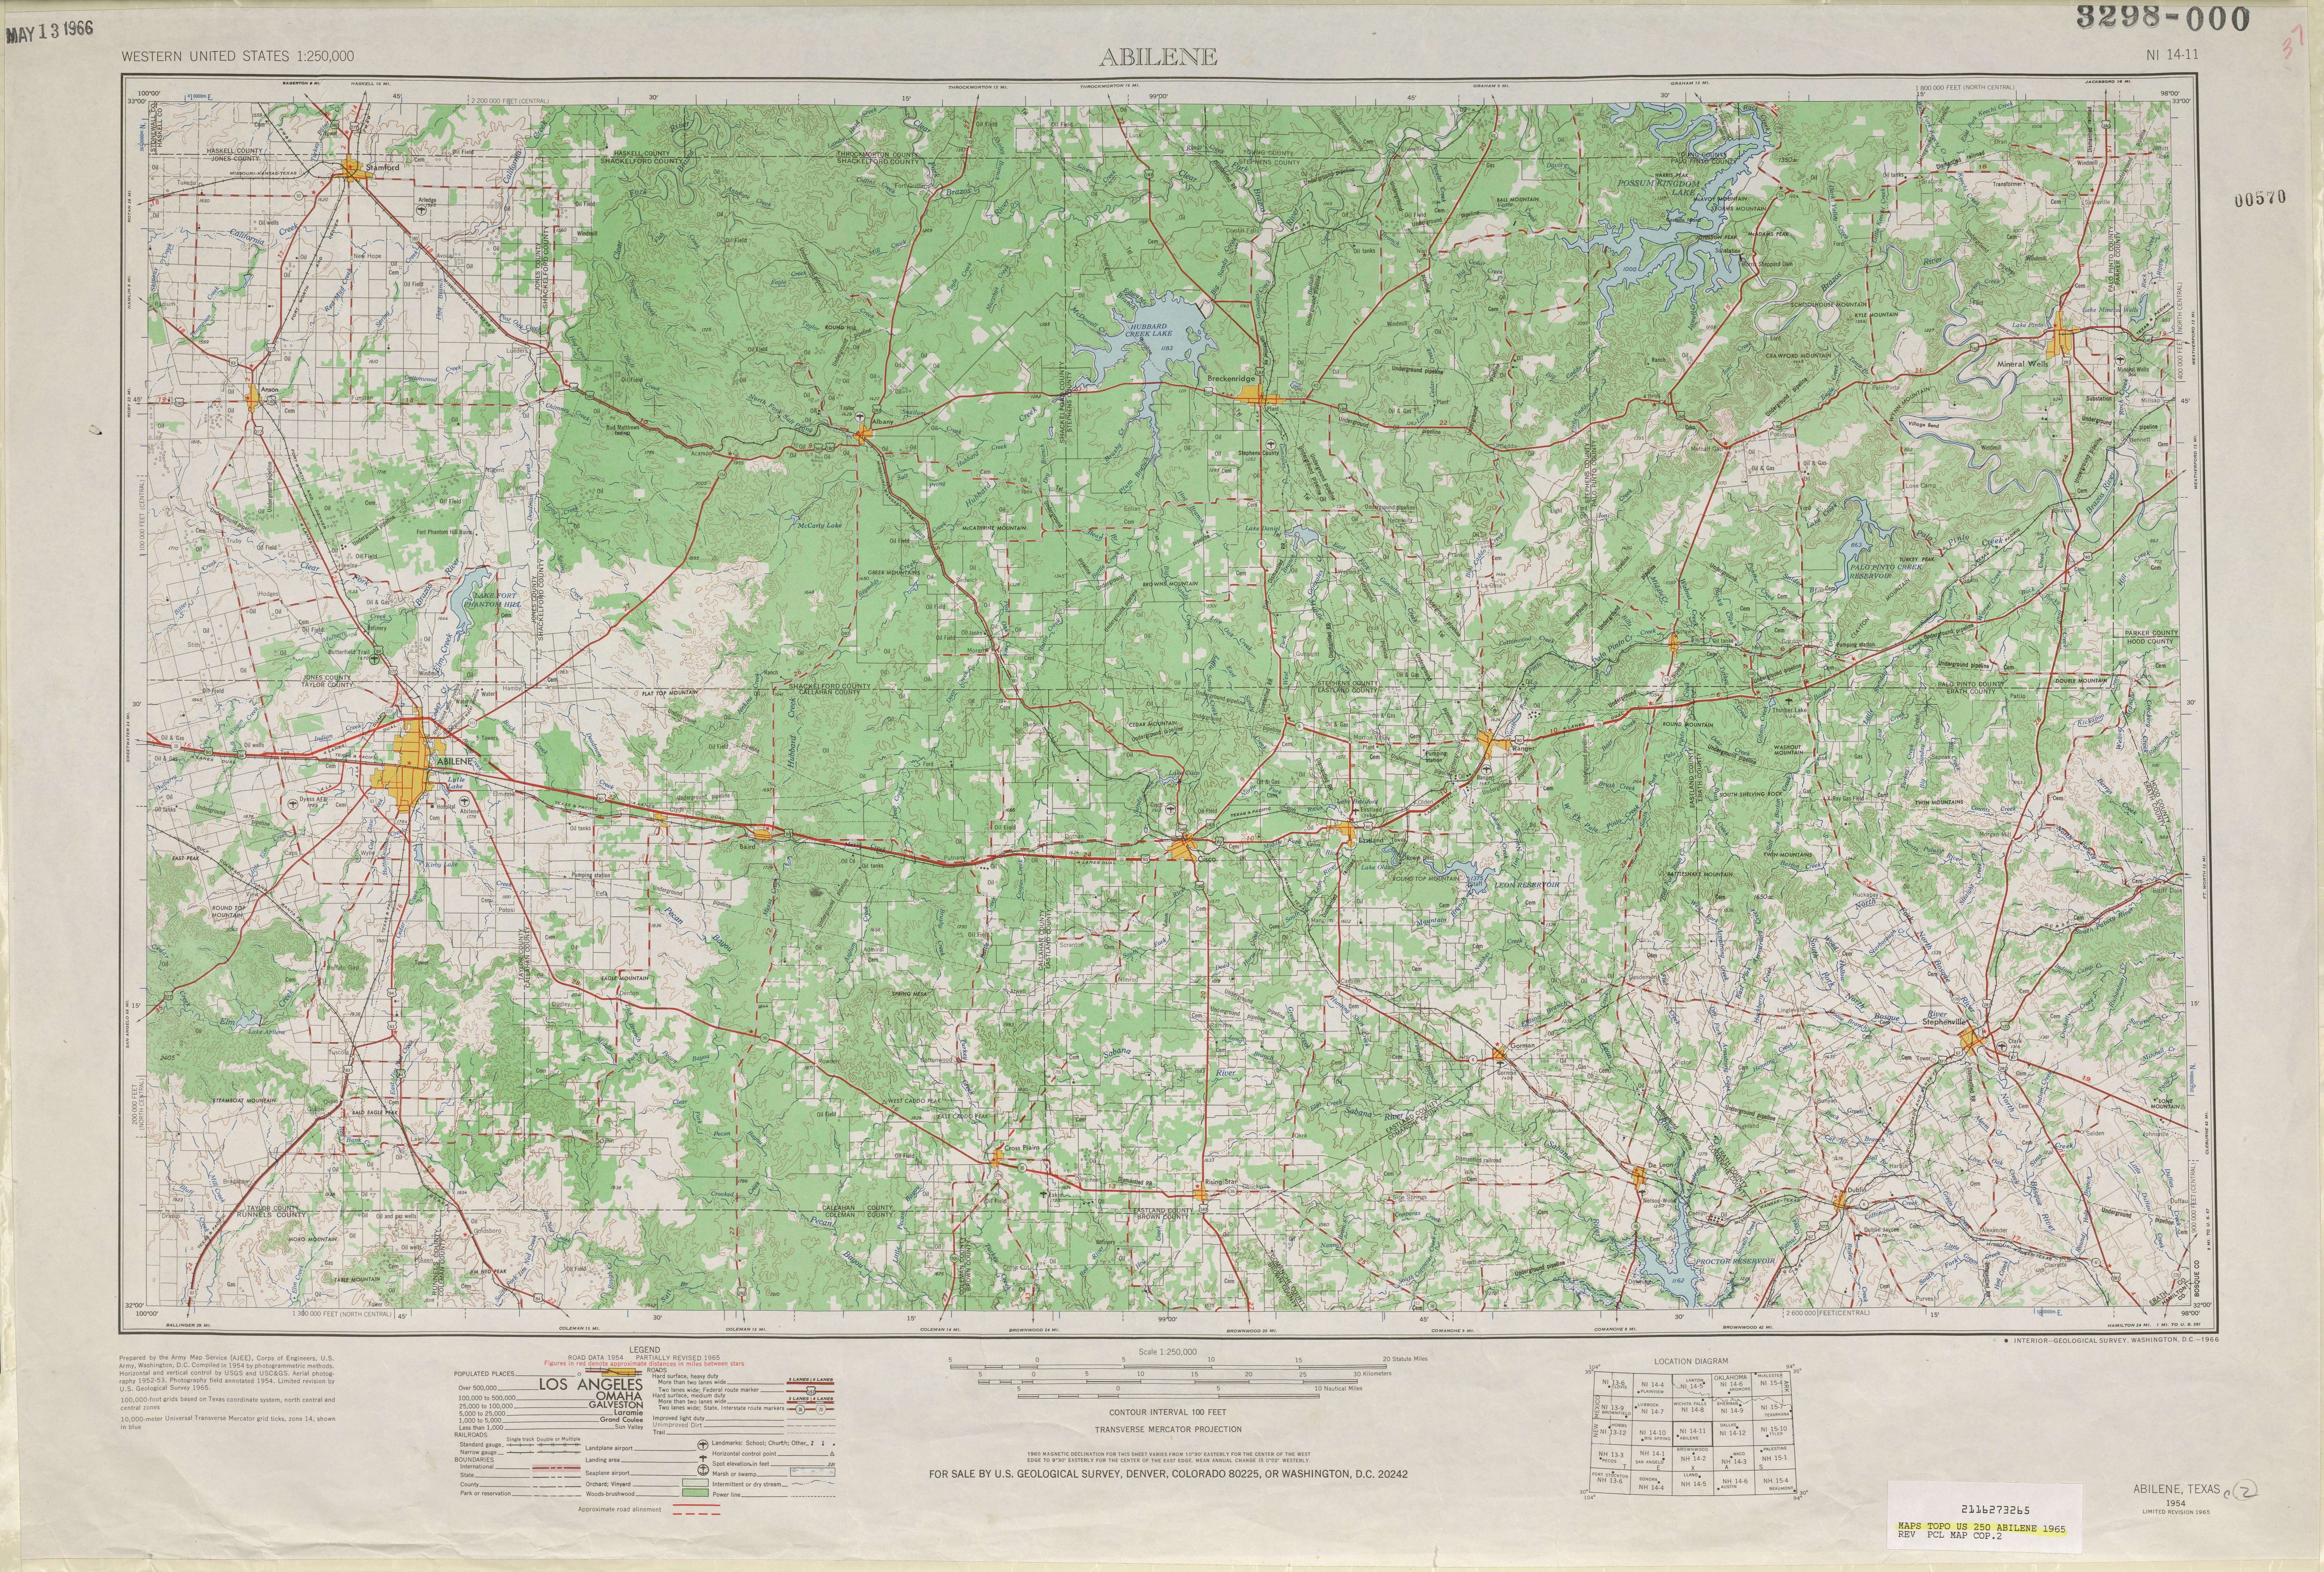 Texas Topographic Maps PerryCastañeda Map Collection UT - Us topographic maps online